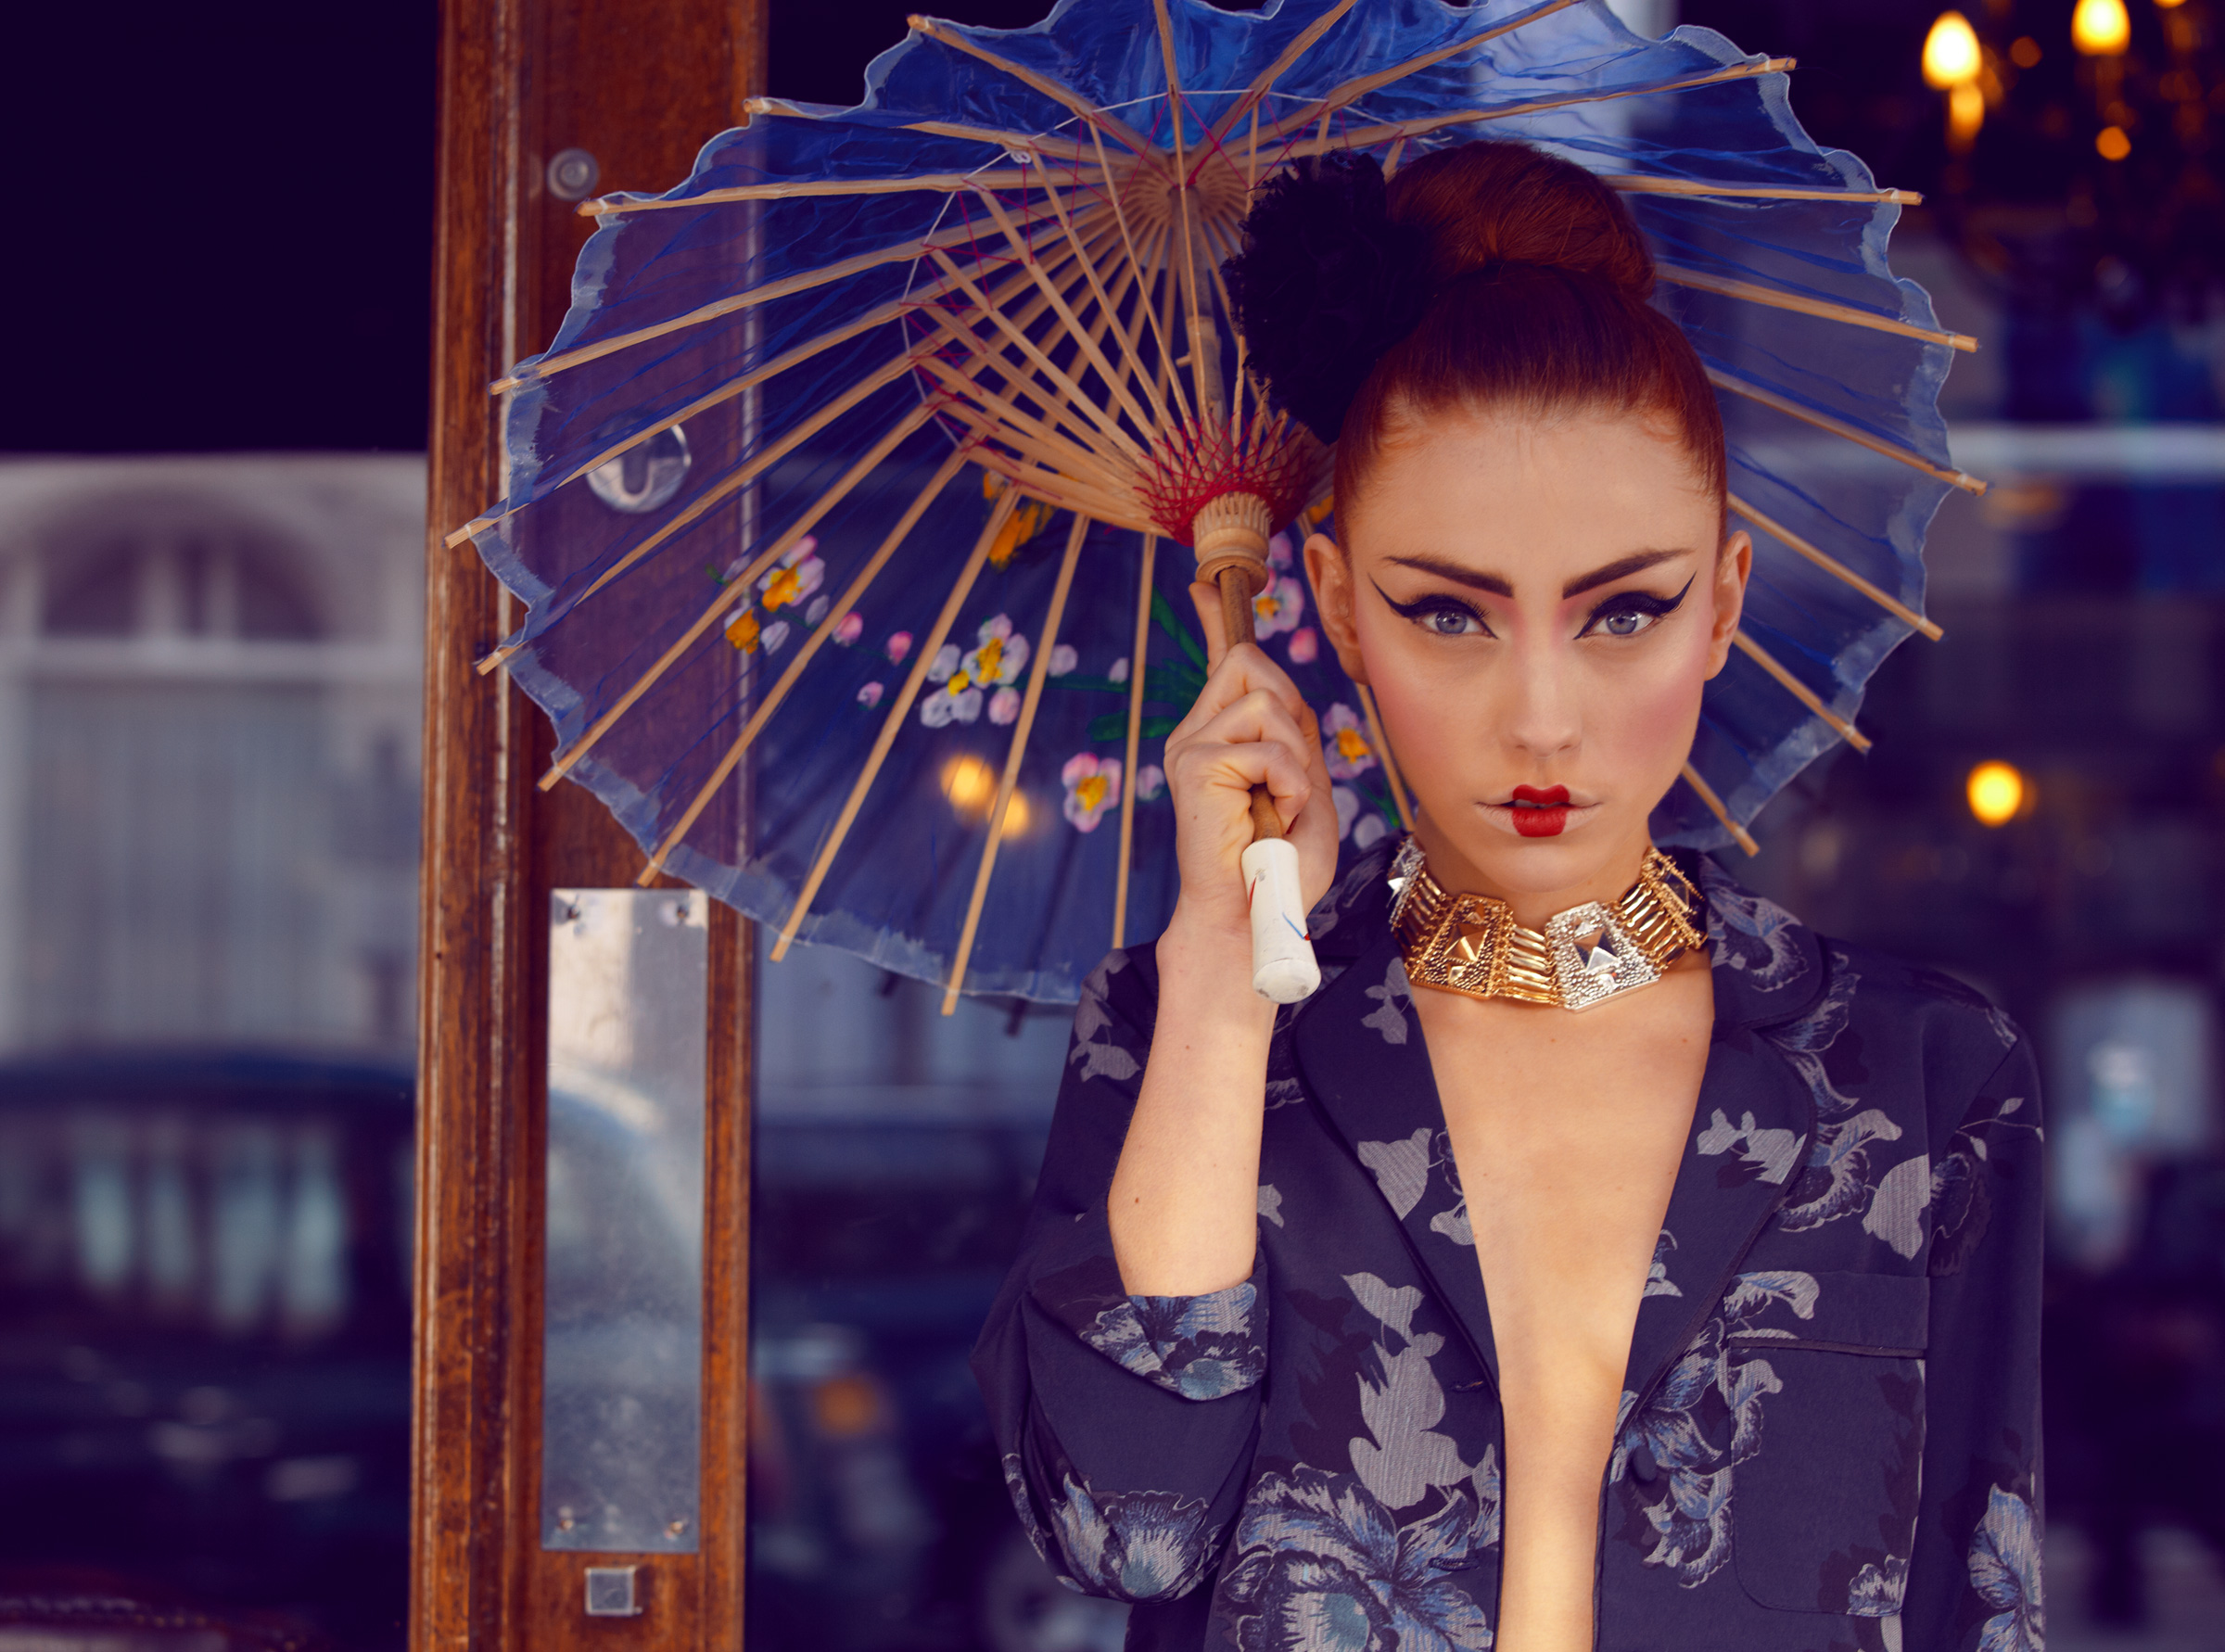 JC-GEISHA---RIO-DEBOLLA-Models1UK-Melissa-Uren-Photography-FEB-2014-LOOK-10620-FINAL-WEB-V2.jpg